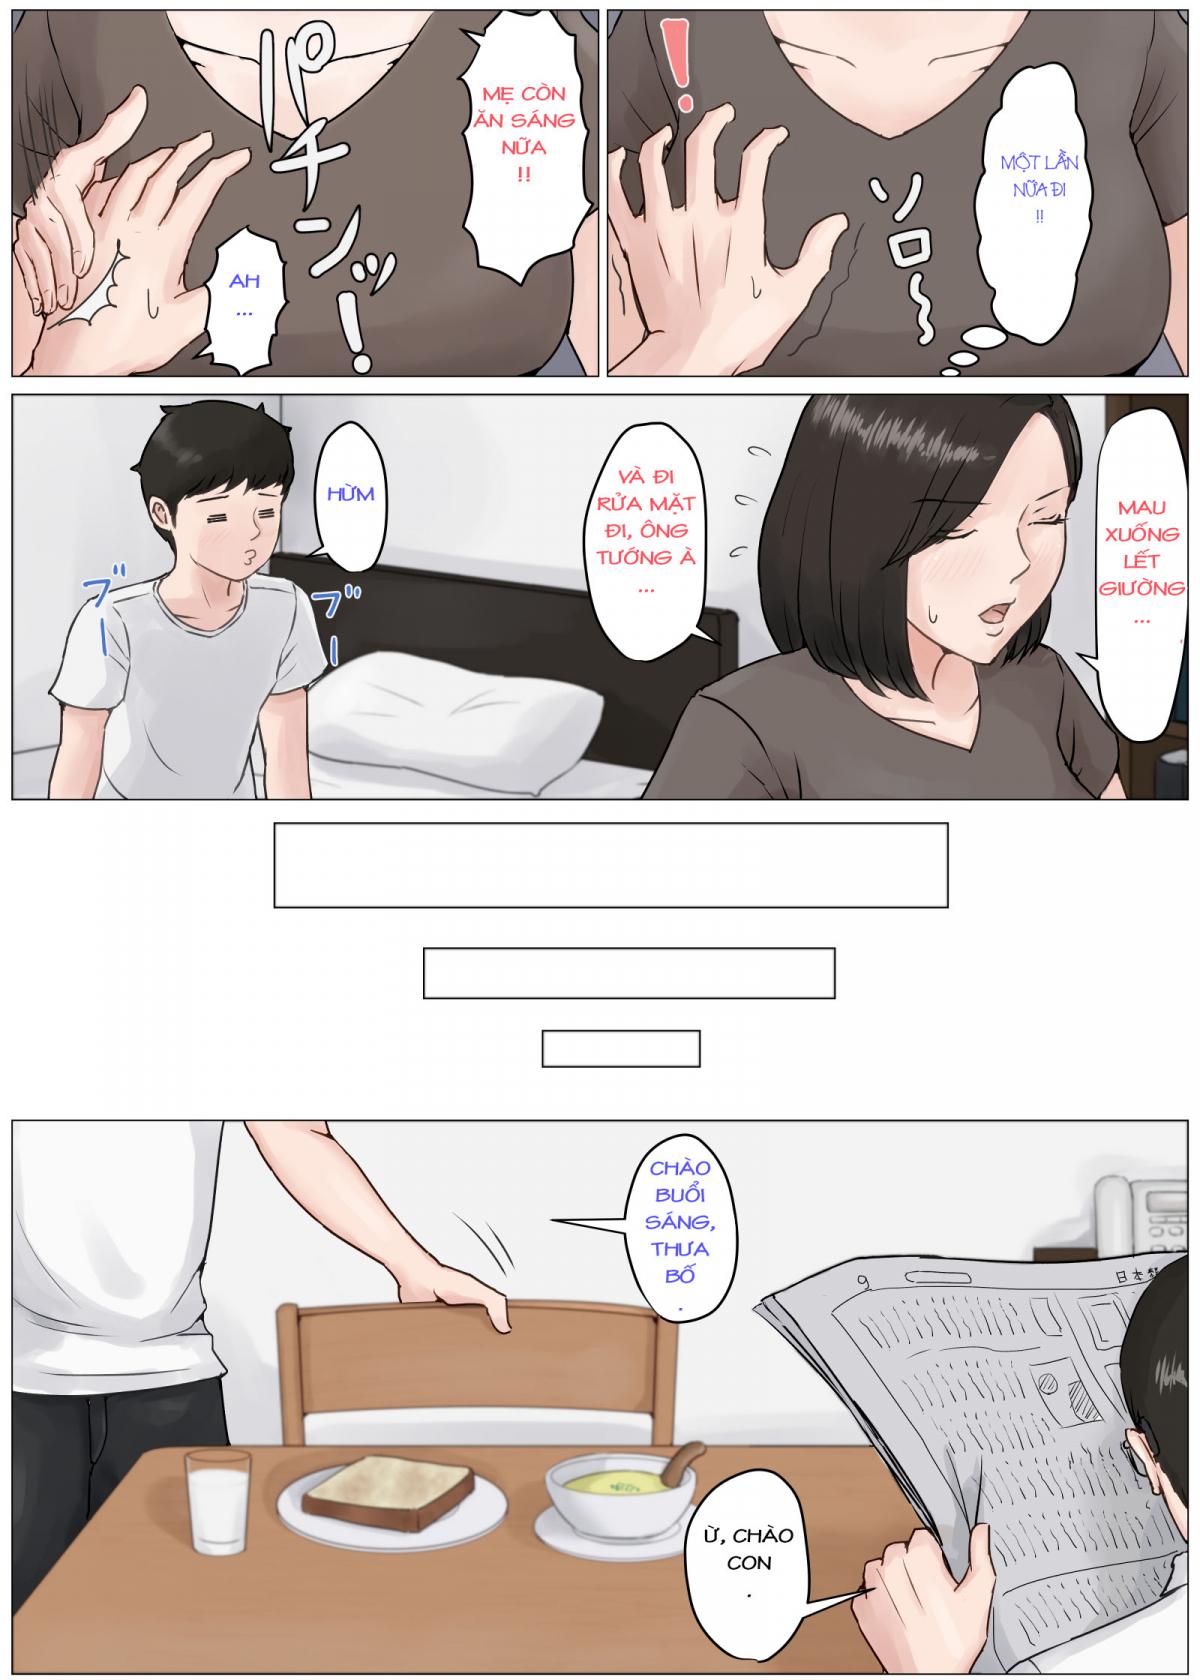 HentaiVN.net - Ảnh 12 - Kaa-san Janakya Dame Nanda!! 3 ~Natsuyasumi Zenpen~ - Mother it has to be you ~Summer Holiday First Part 1~ - Oneshot